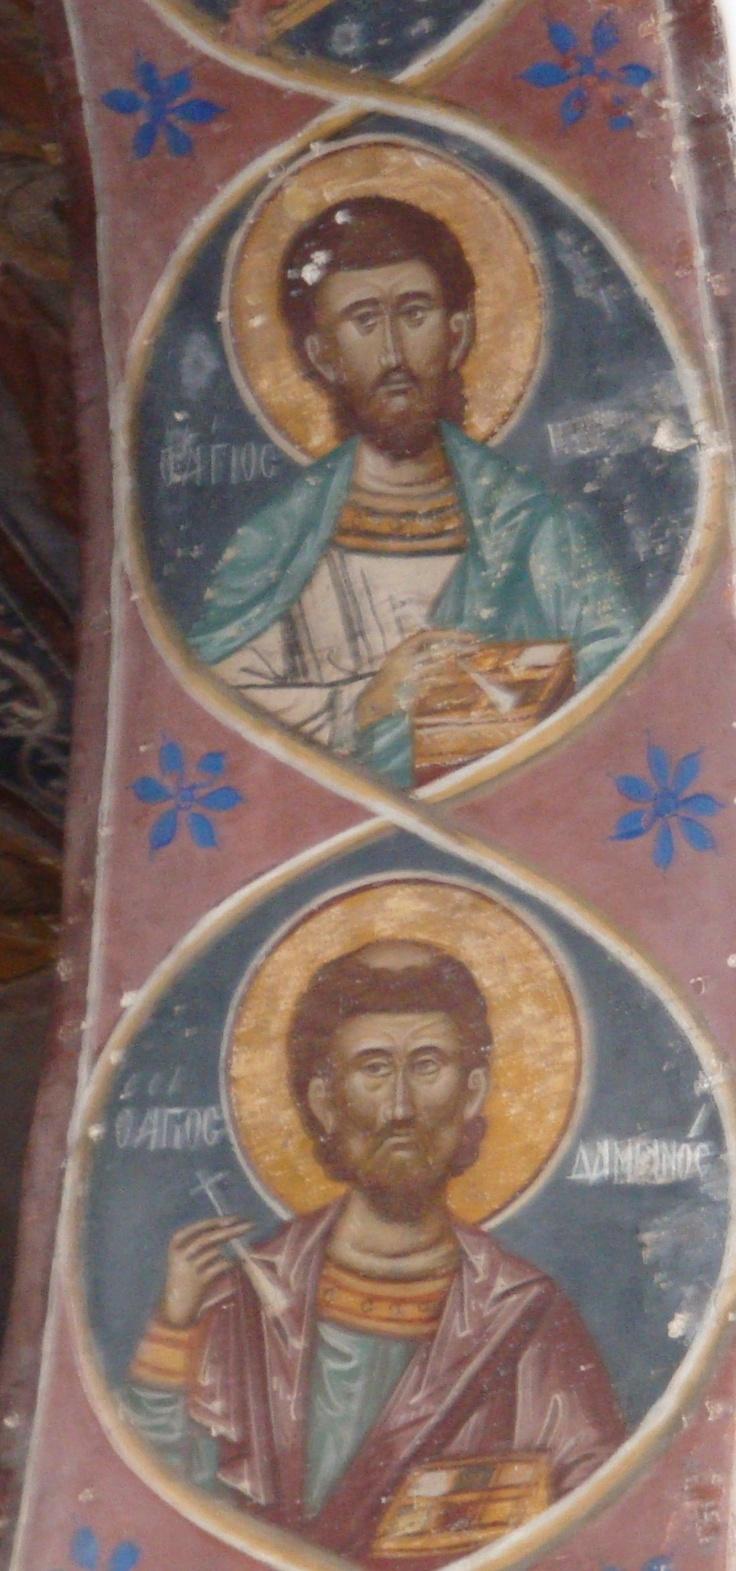 Paintings on Patmos Greece taken by Kelli Bruns